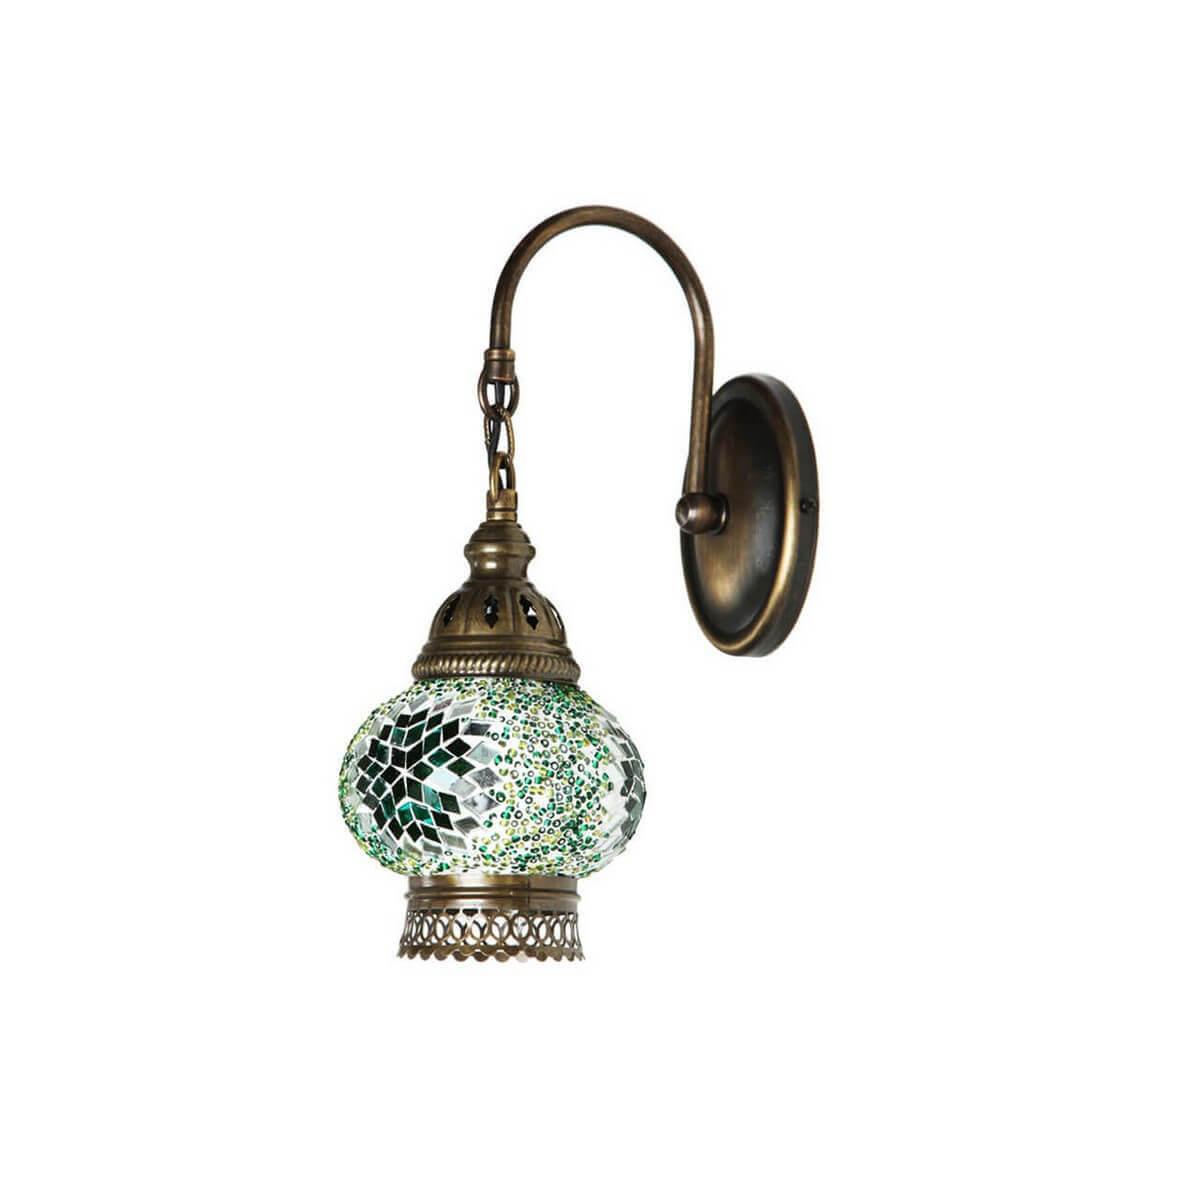 Бра Kink Light 0812TA,07 Марокко косметика из марокко купить